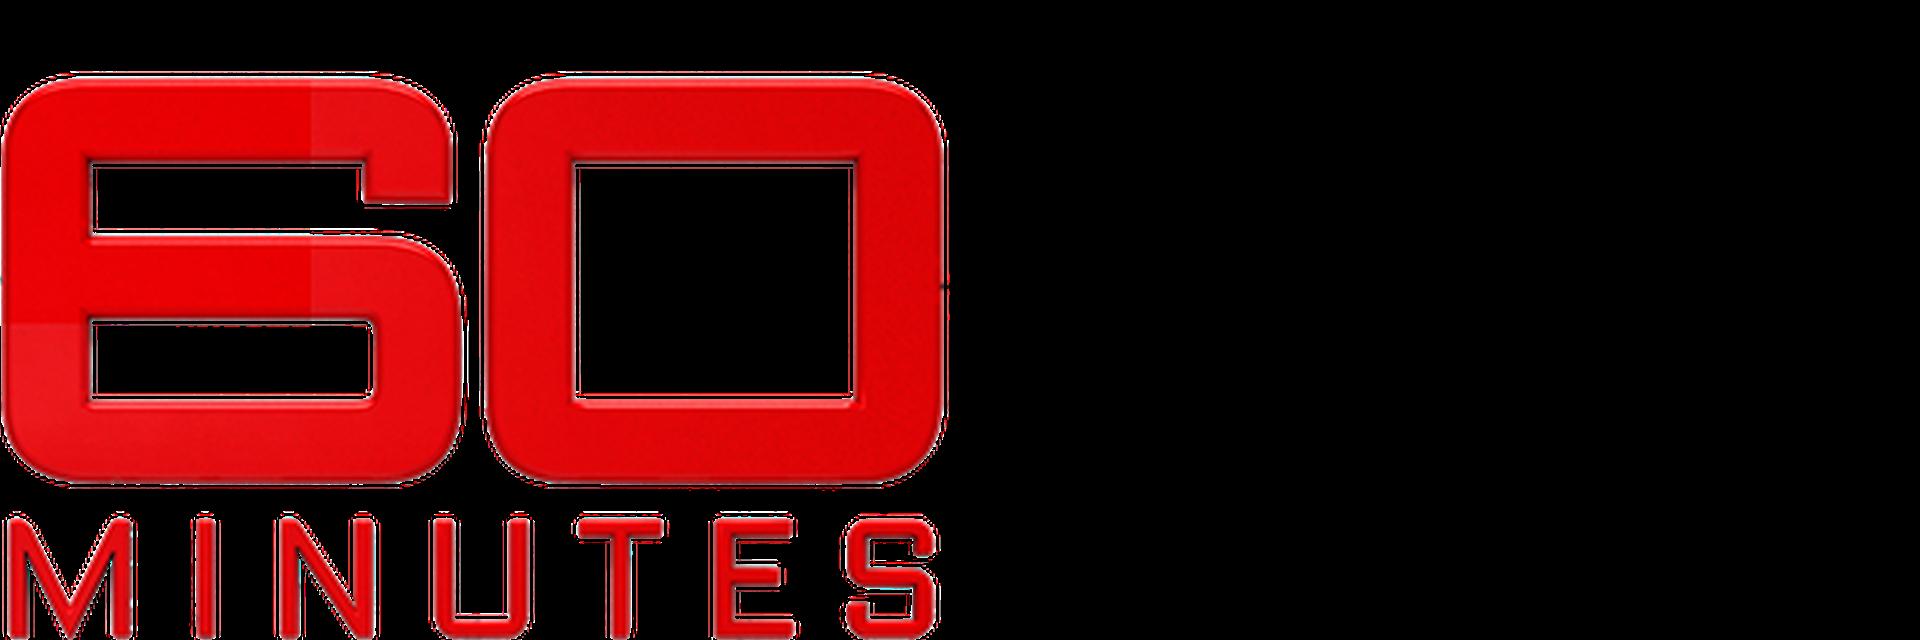 60 Minutes timeless: V8 Sheikh: 60 Minutes 2016, Short Video.